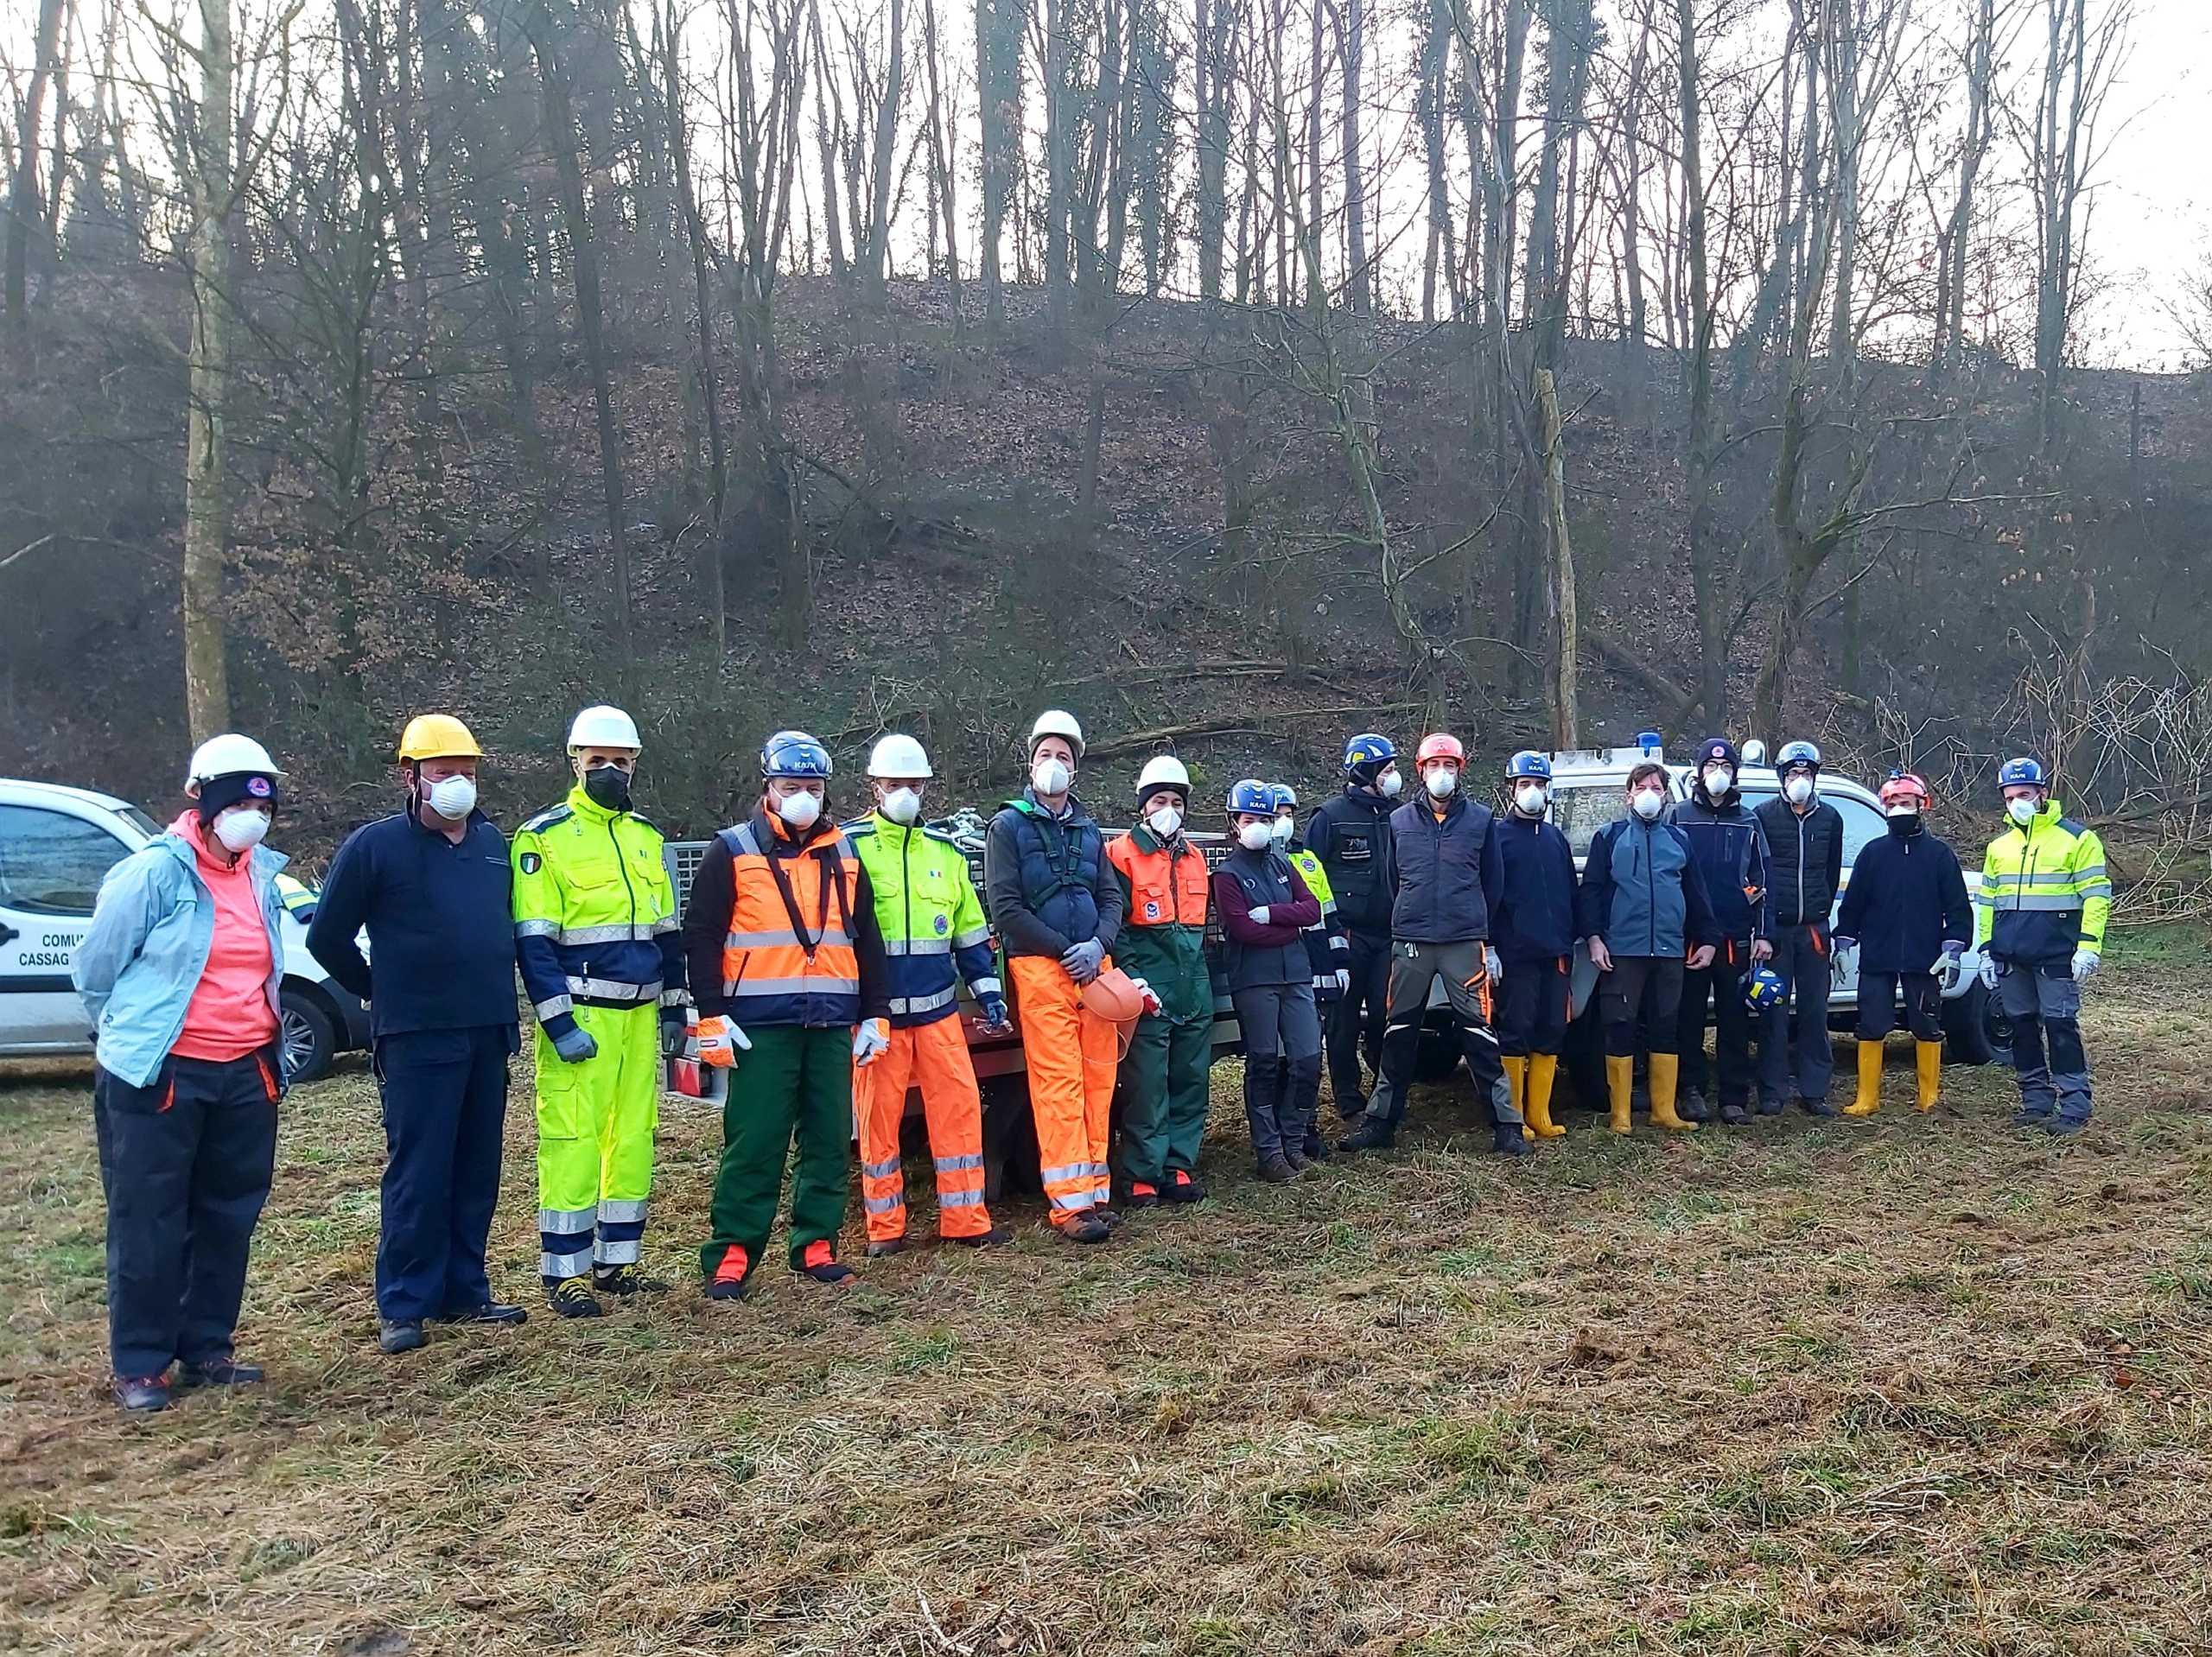 Protezione Civile Bulciago - fiumi sicuri 2021 - torrente Bevera (1)